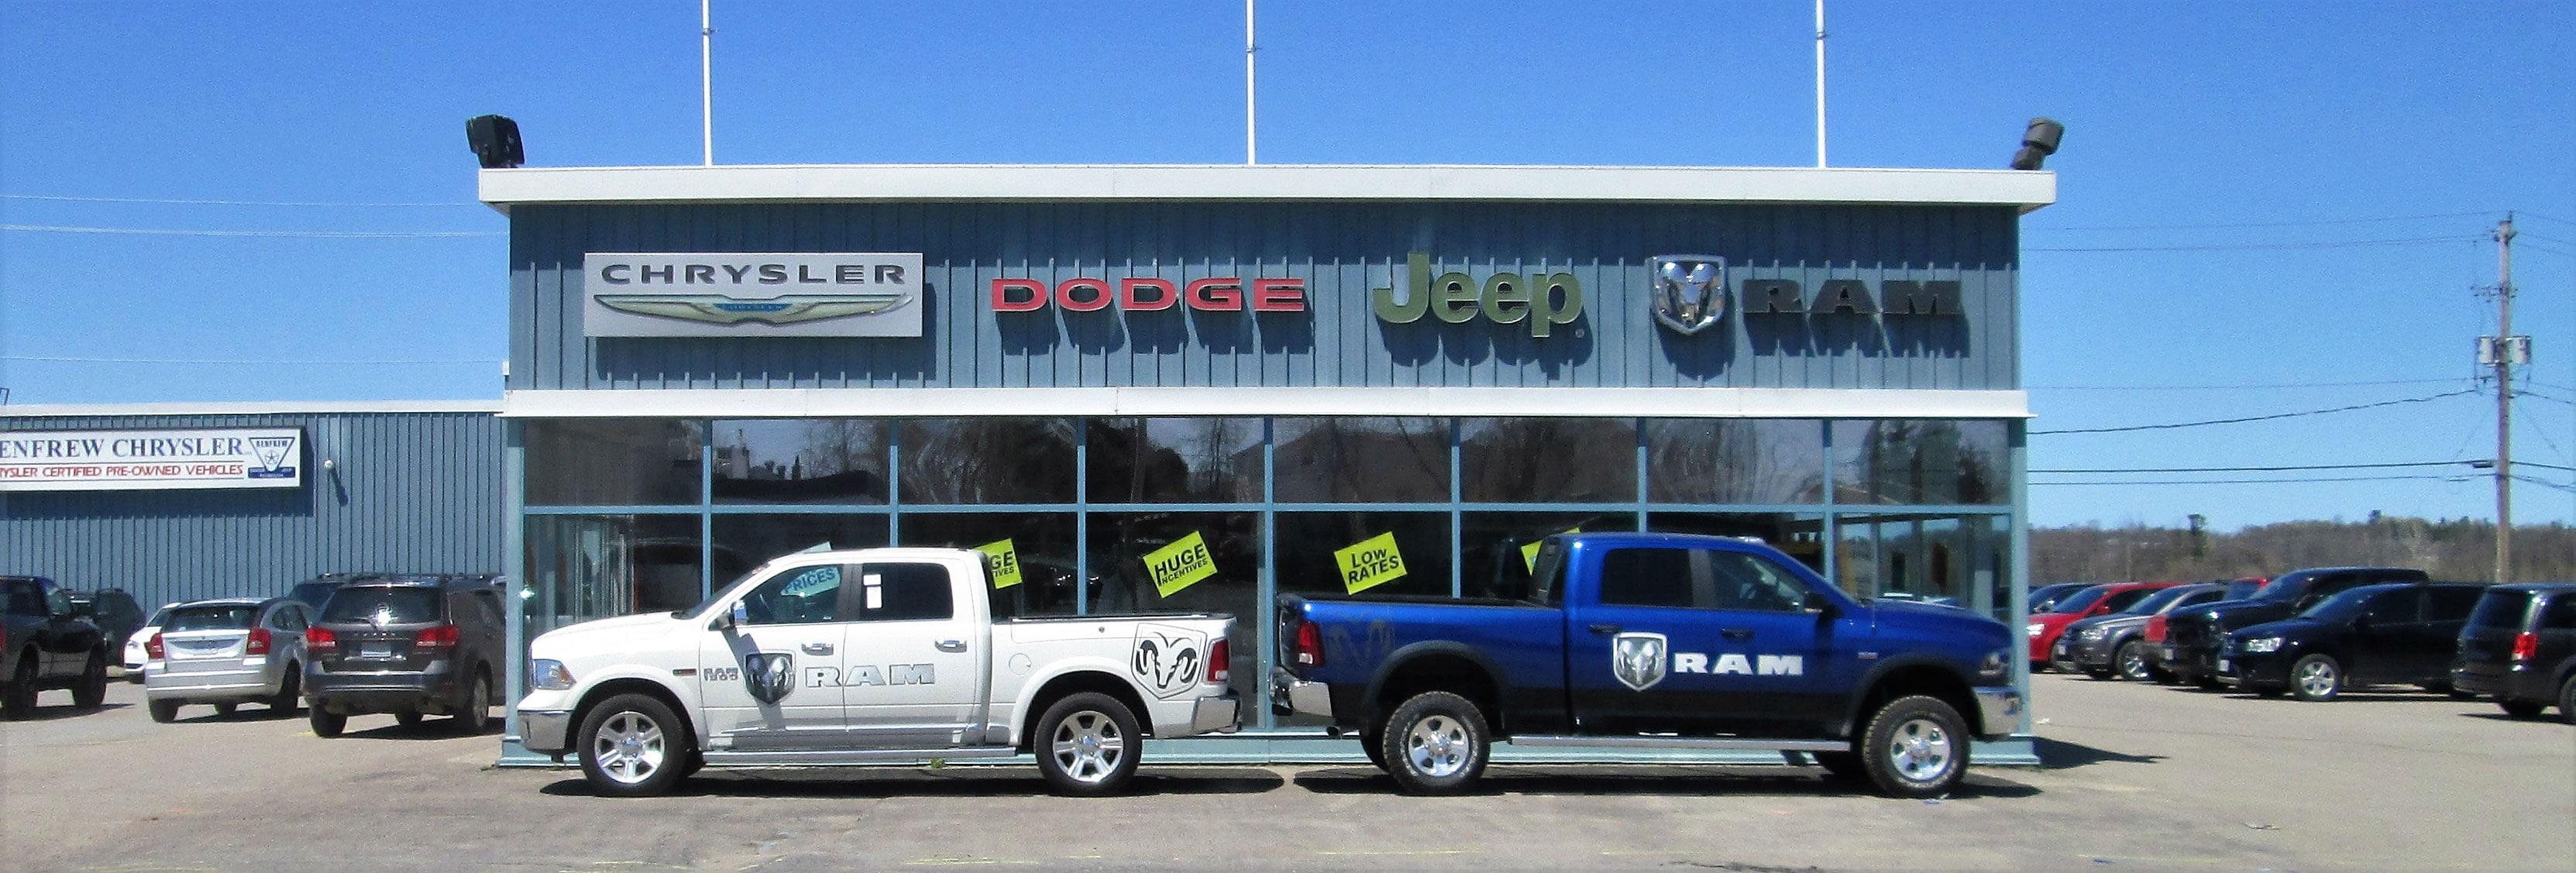 dealership ram jeep days drive dodge dealer toronto chrysler serpa